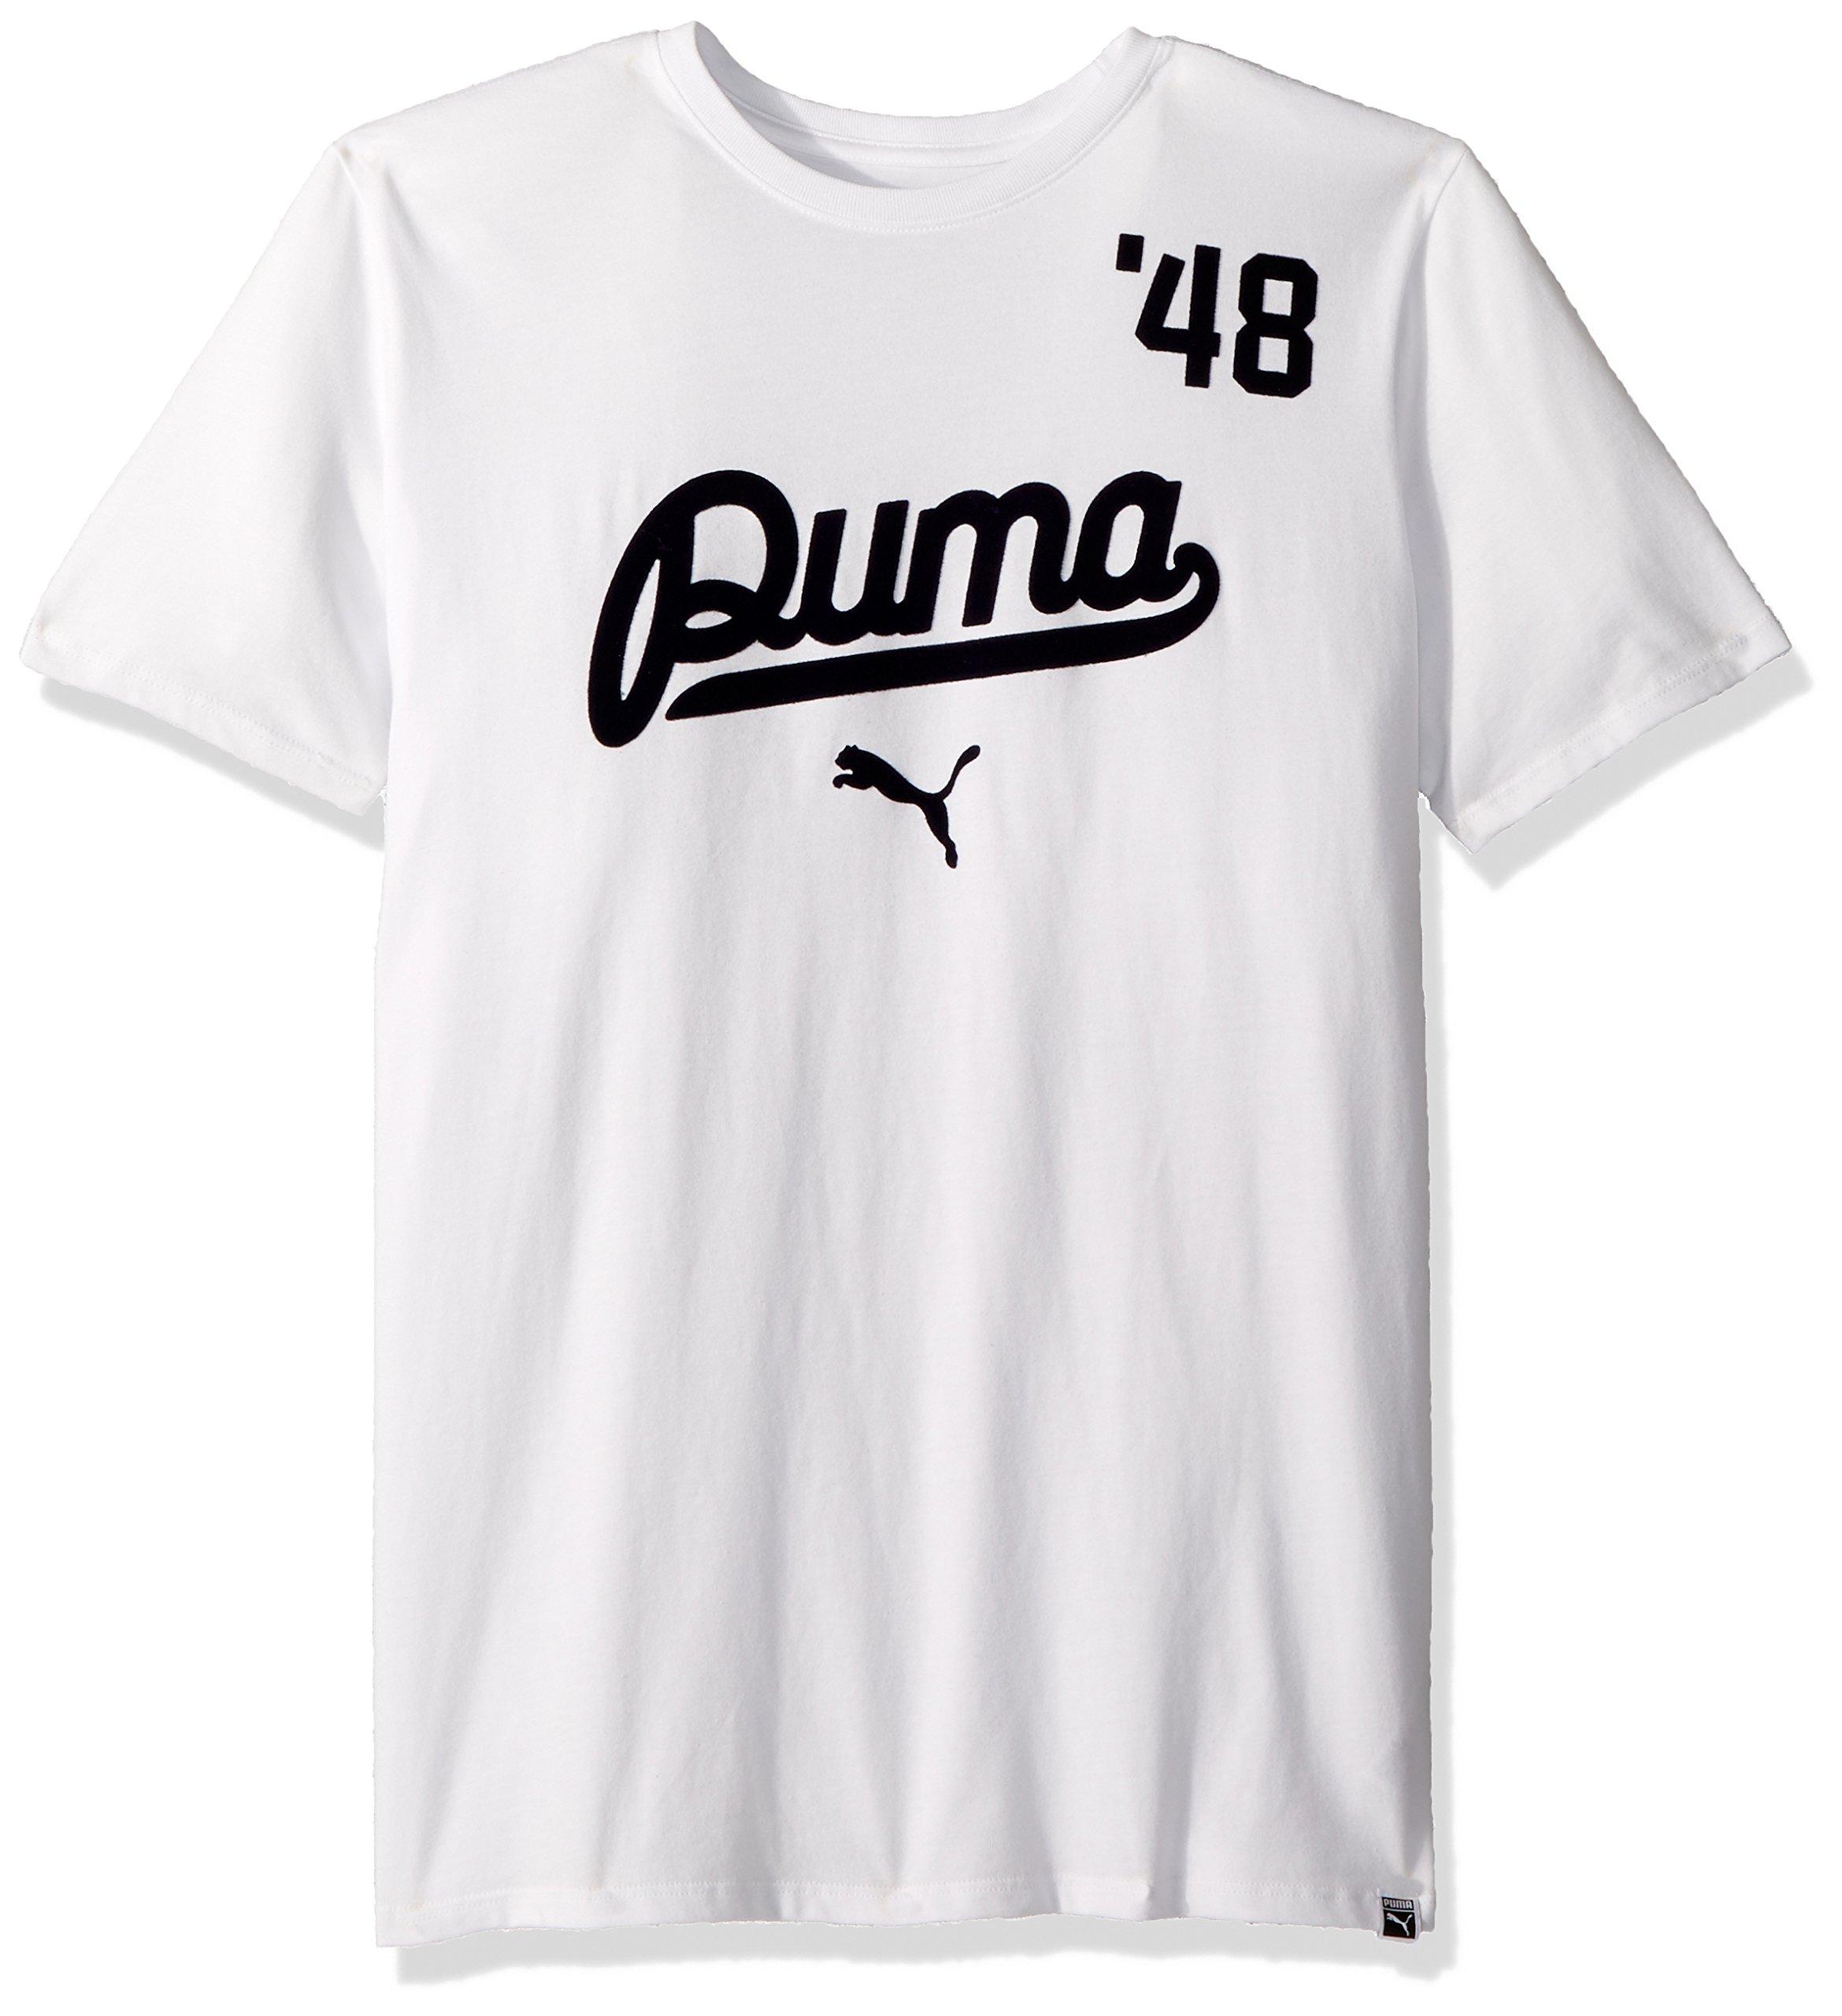 PUMA Men's Street Script T-Shirt, White/Peacoat, S